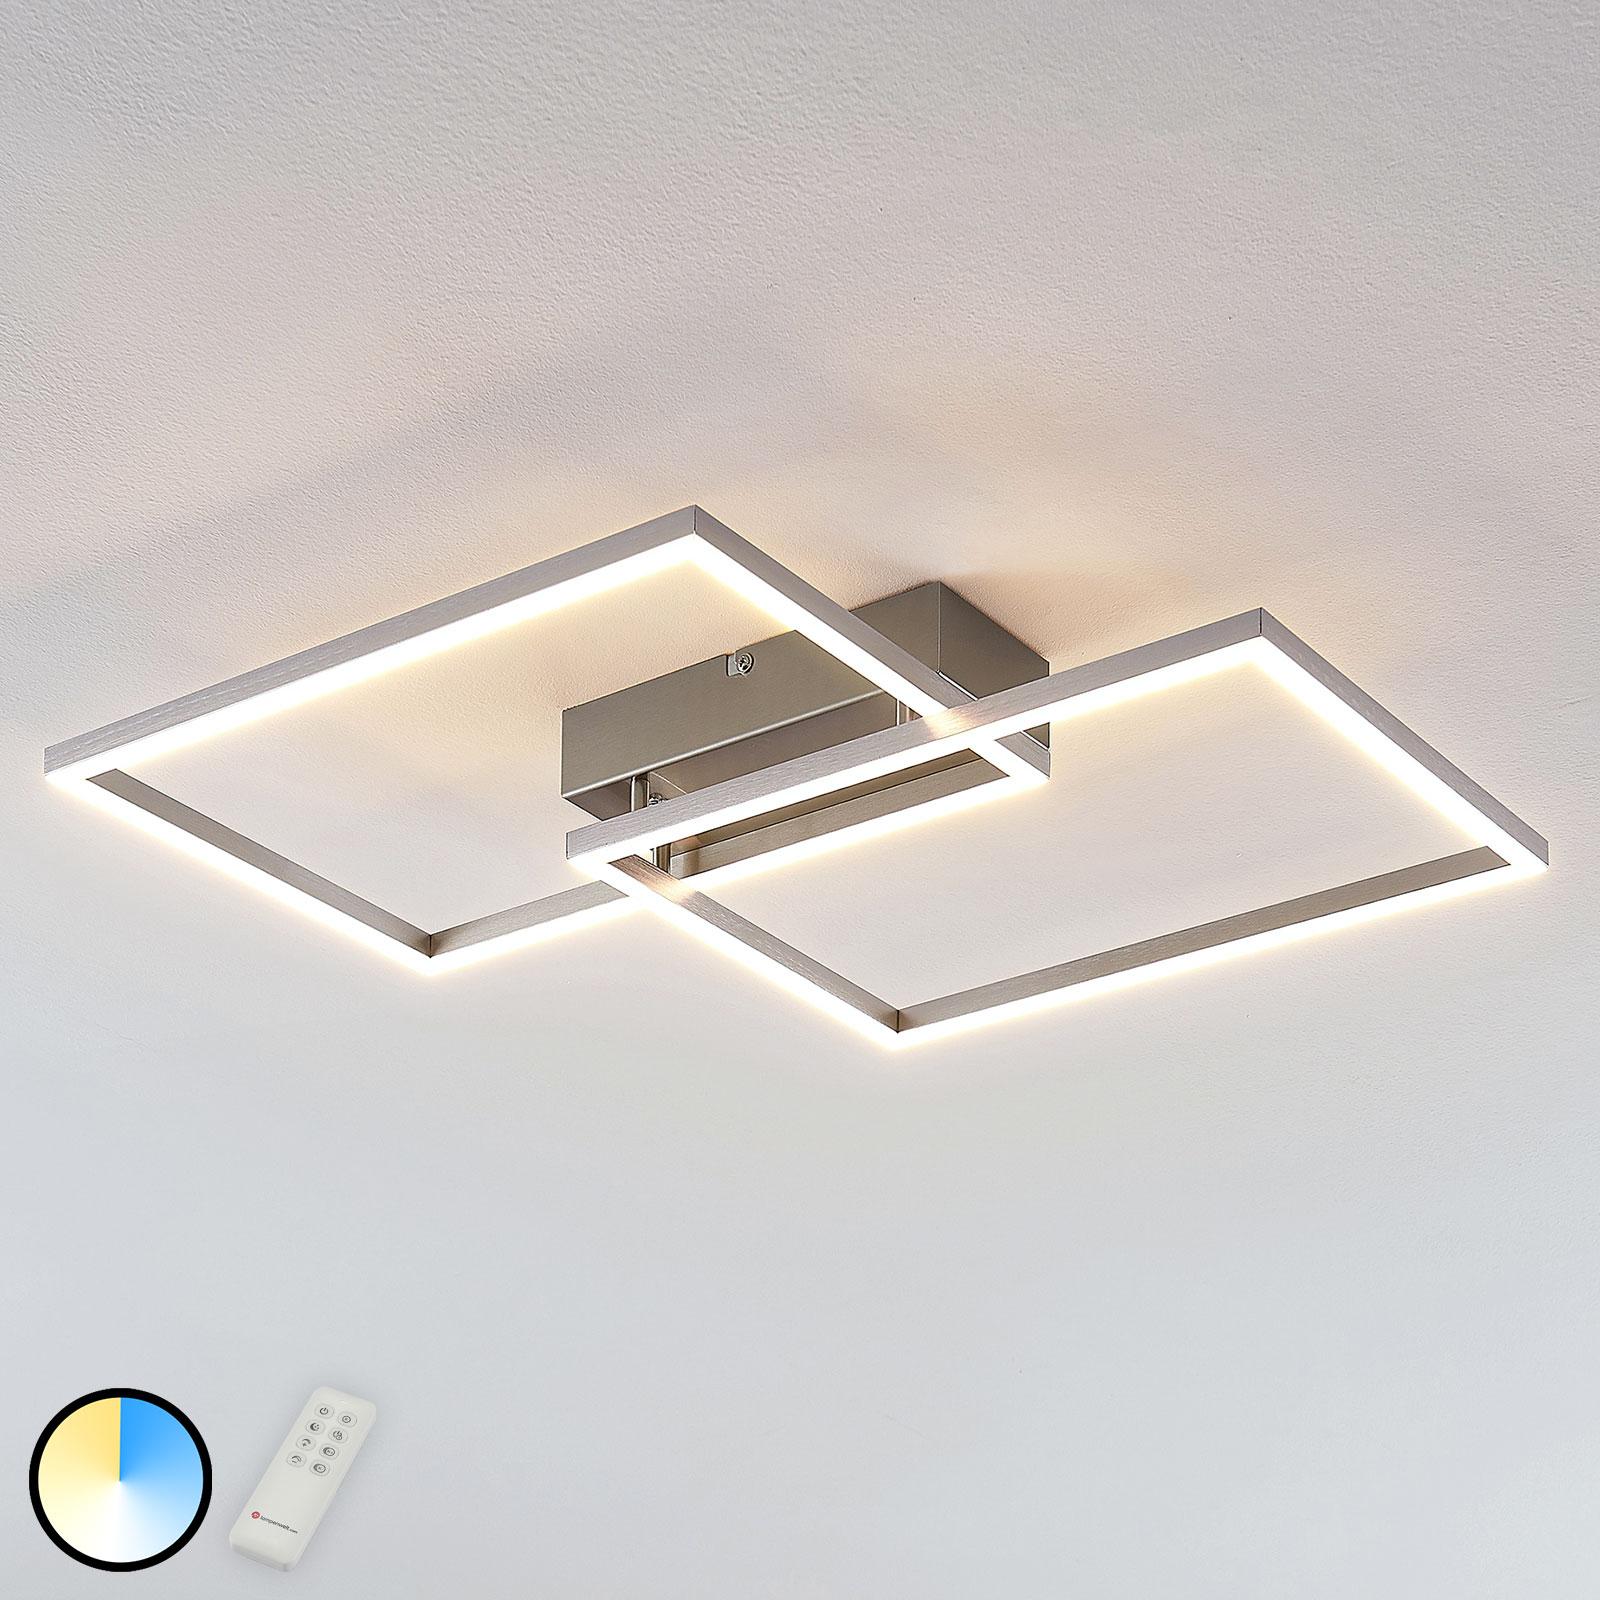 Lampa sufitowa LED Quadra, 2-punktowa, 50 cm